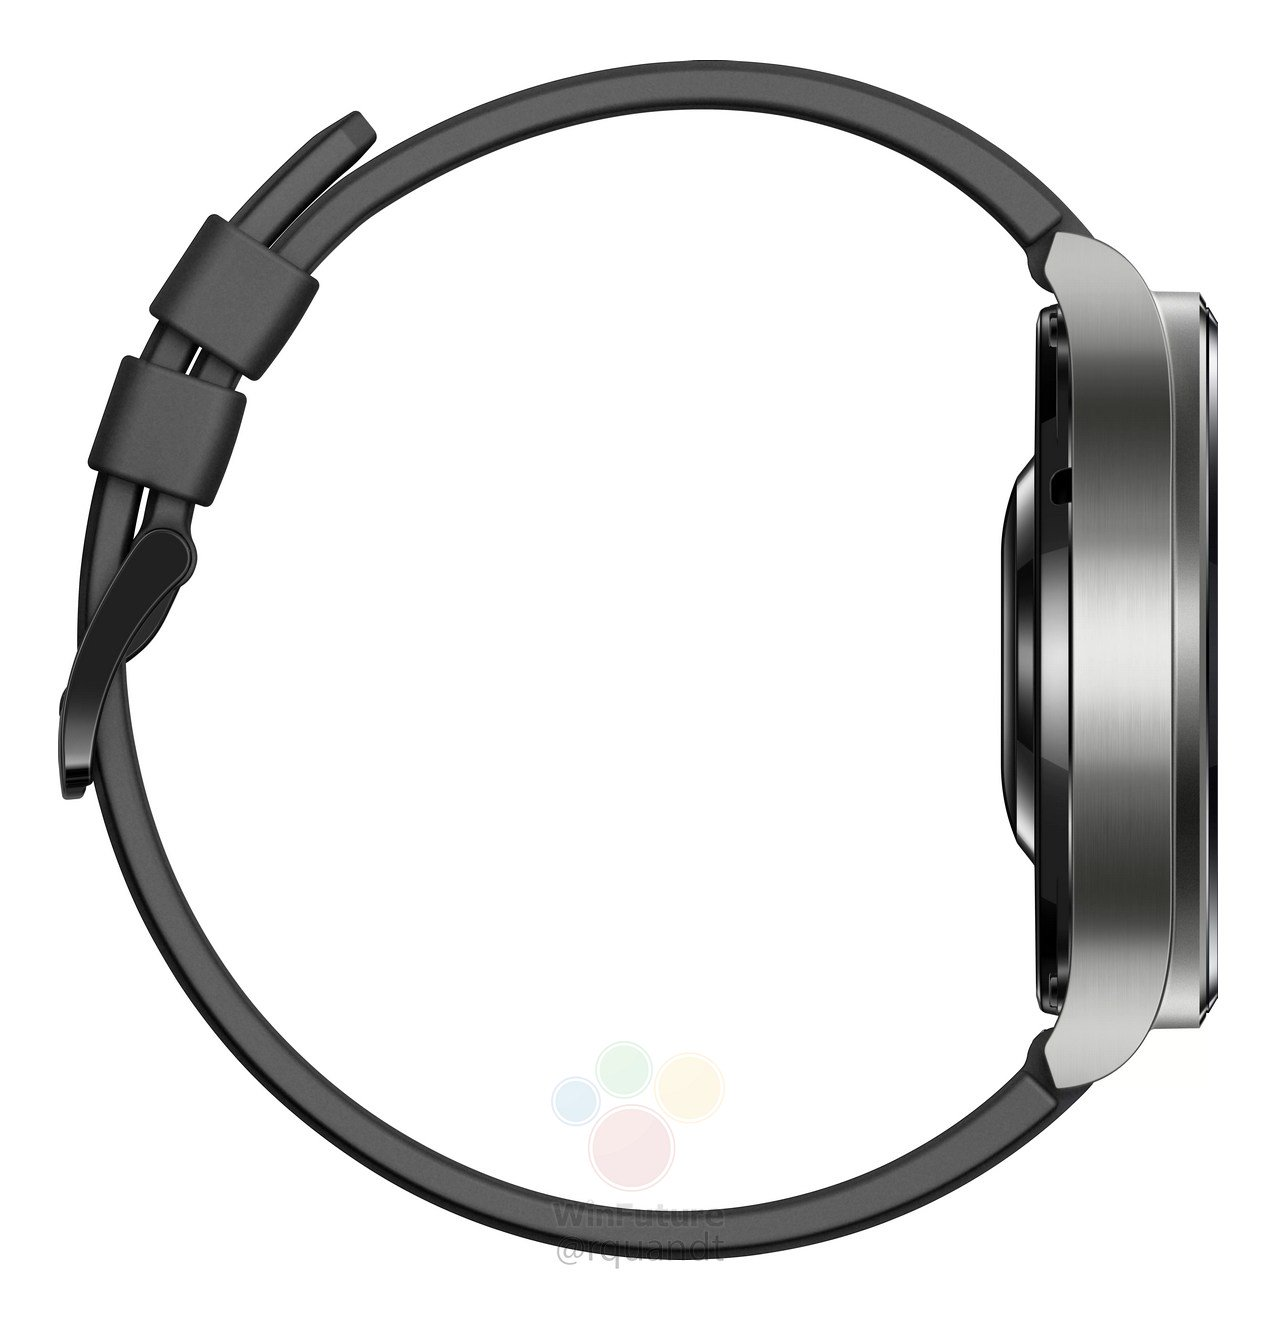 Huawei Watch GT2 Pro 1599138582 0 0 large